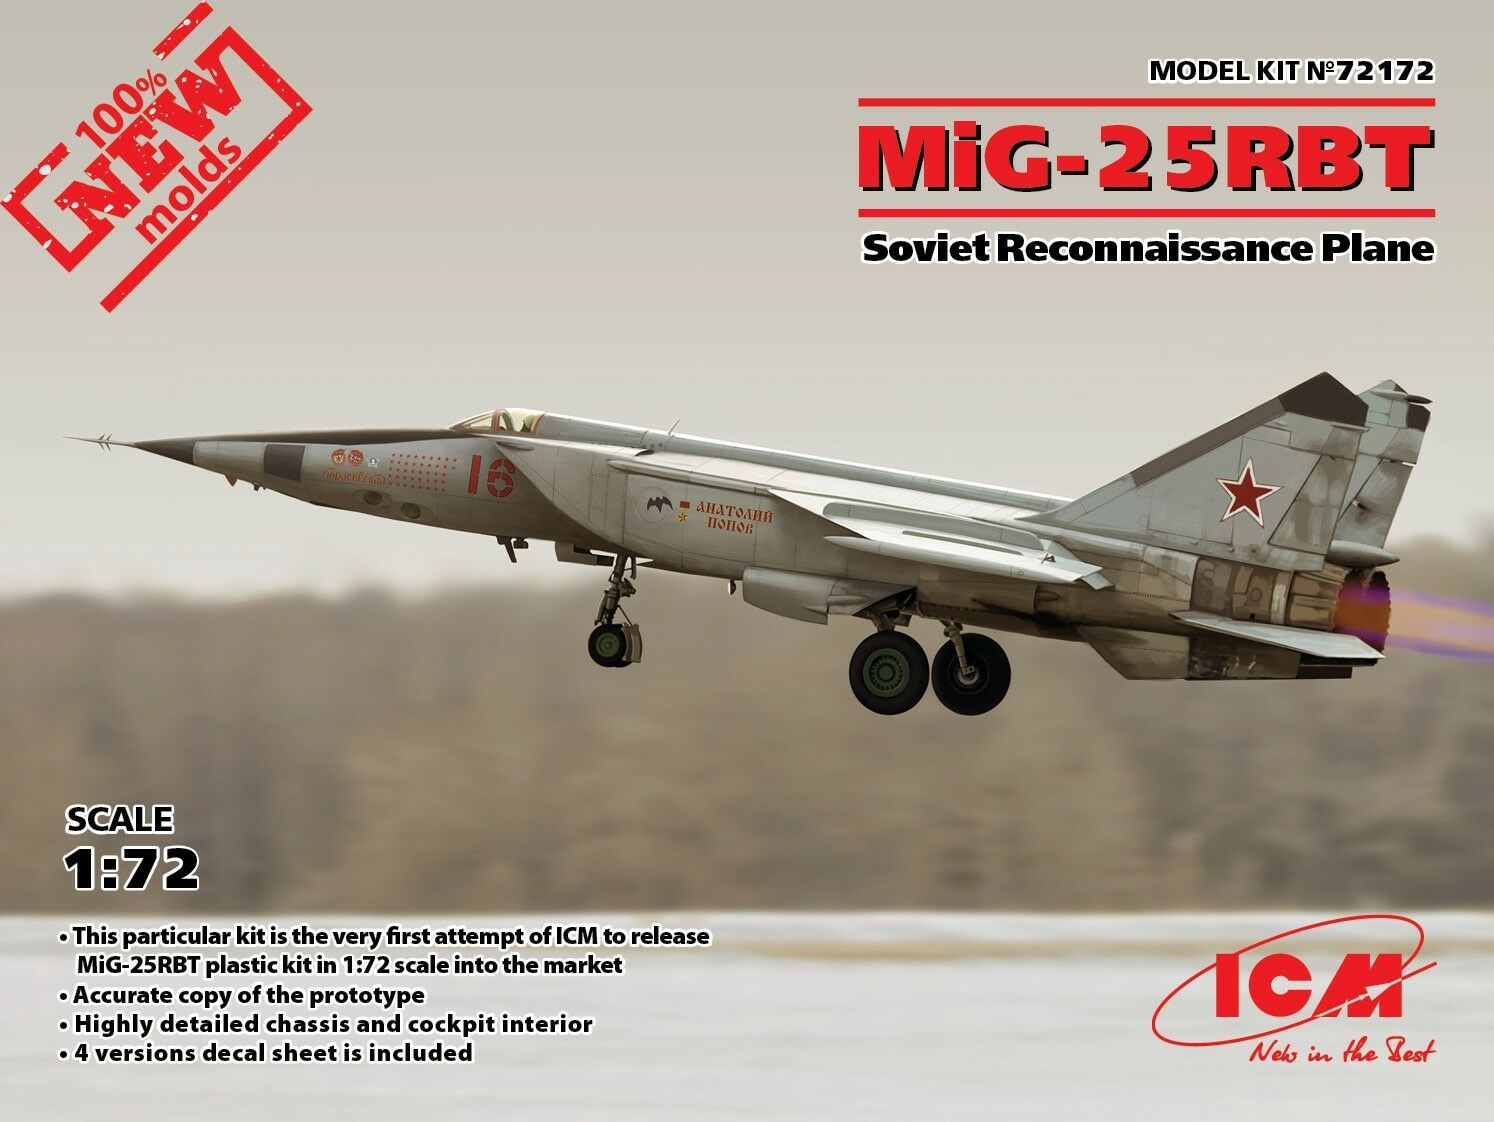 ICM MODELS 72172 RUSSIAN RECONNAISSANCE PLANE MIG-25RBT MODEL KIT 1 72 NEW